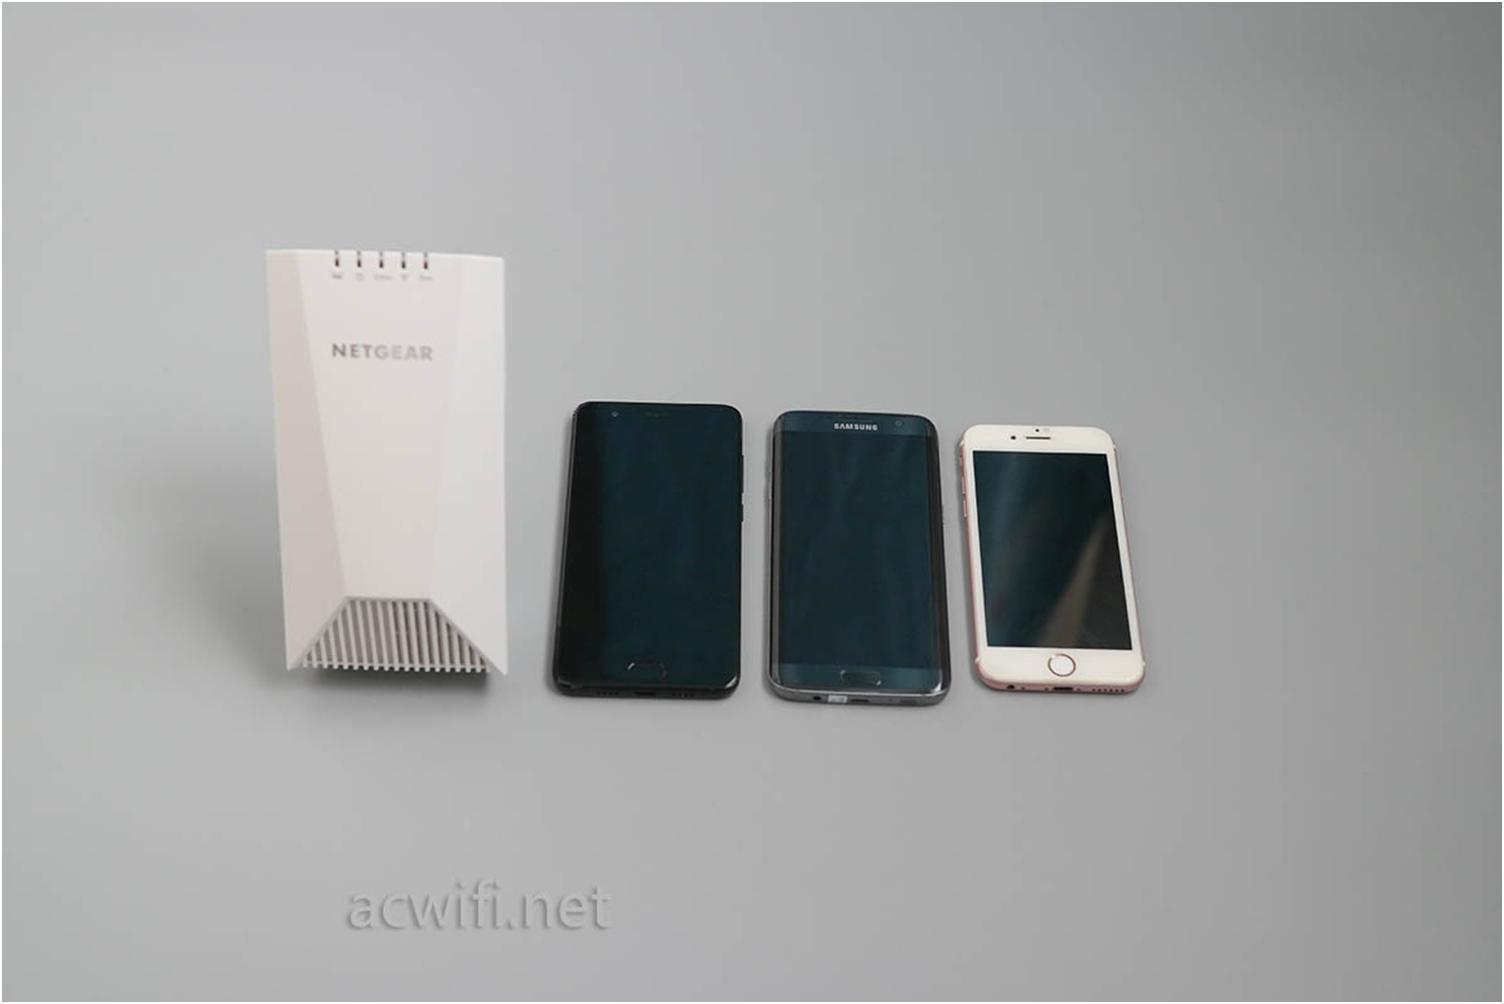 NETGEAR EX7500 Reviewed   WIFI I SEE